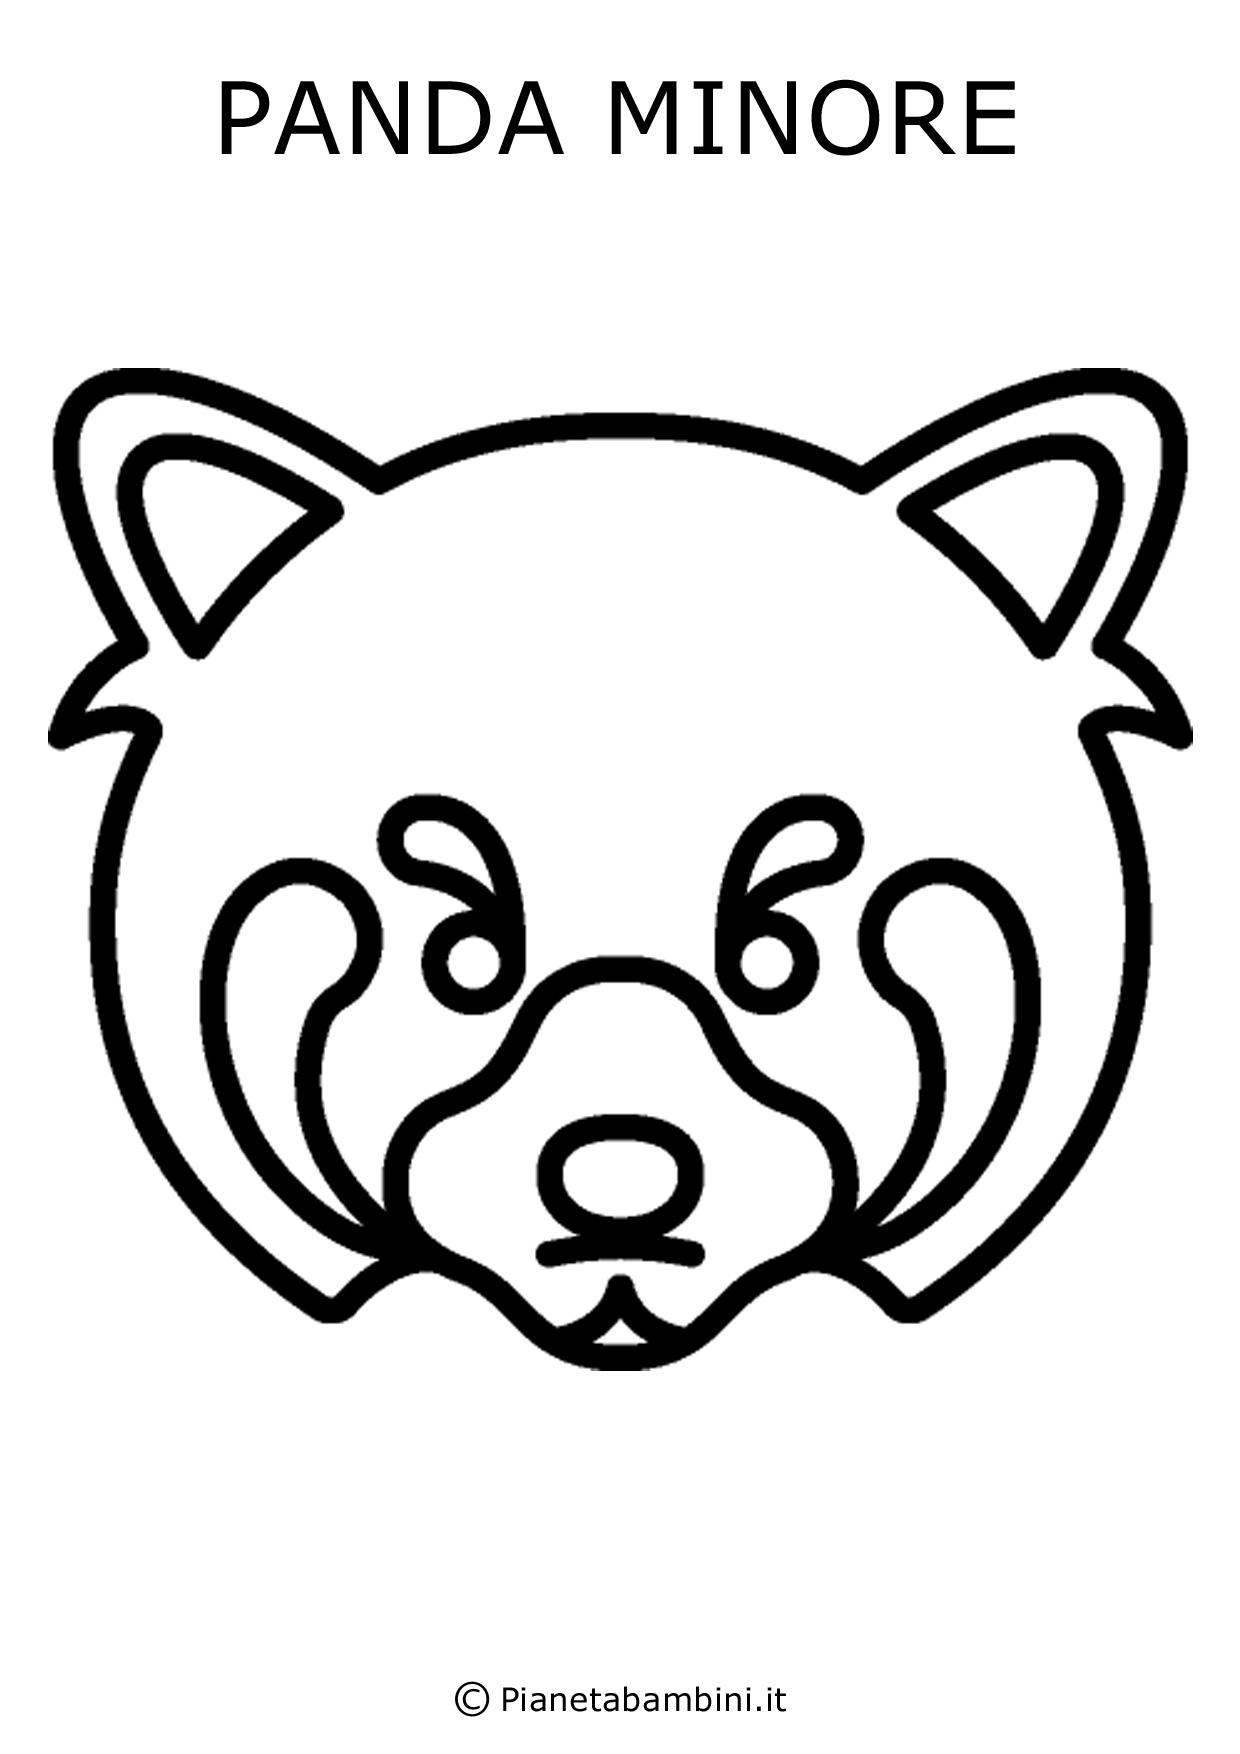 Panda-Minore